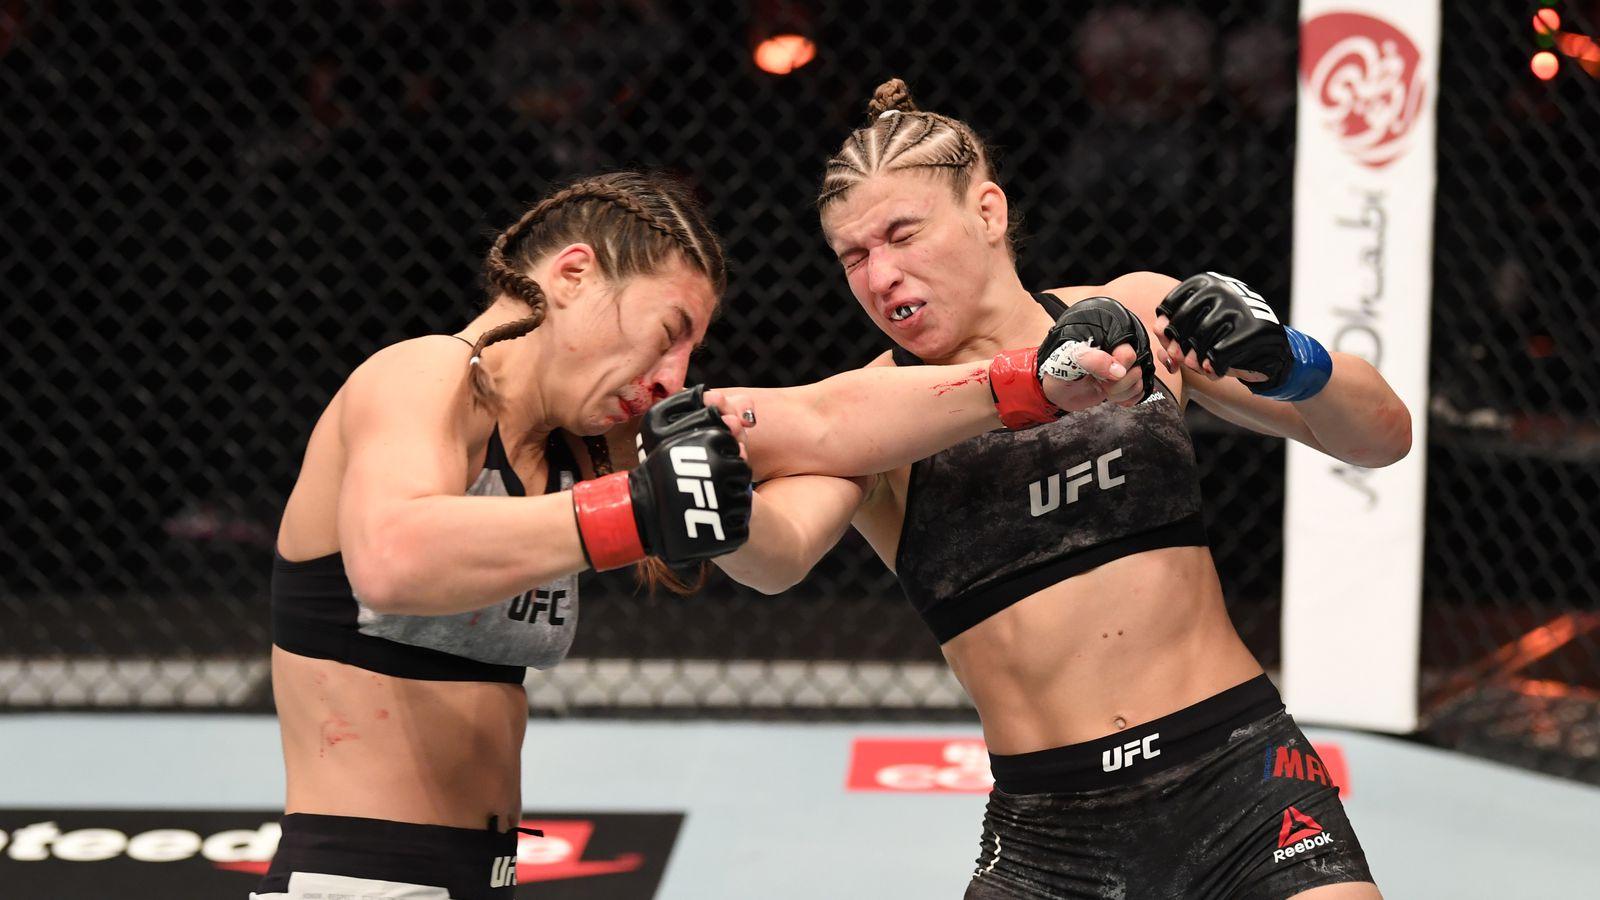 McGregor vs. Cerrone UFC 246: Final Results & Top Moments